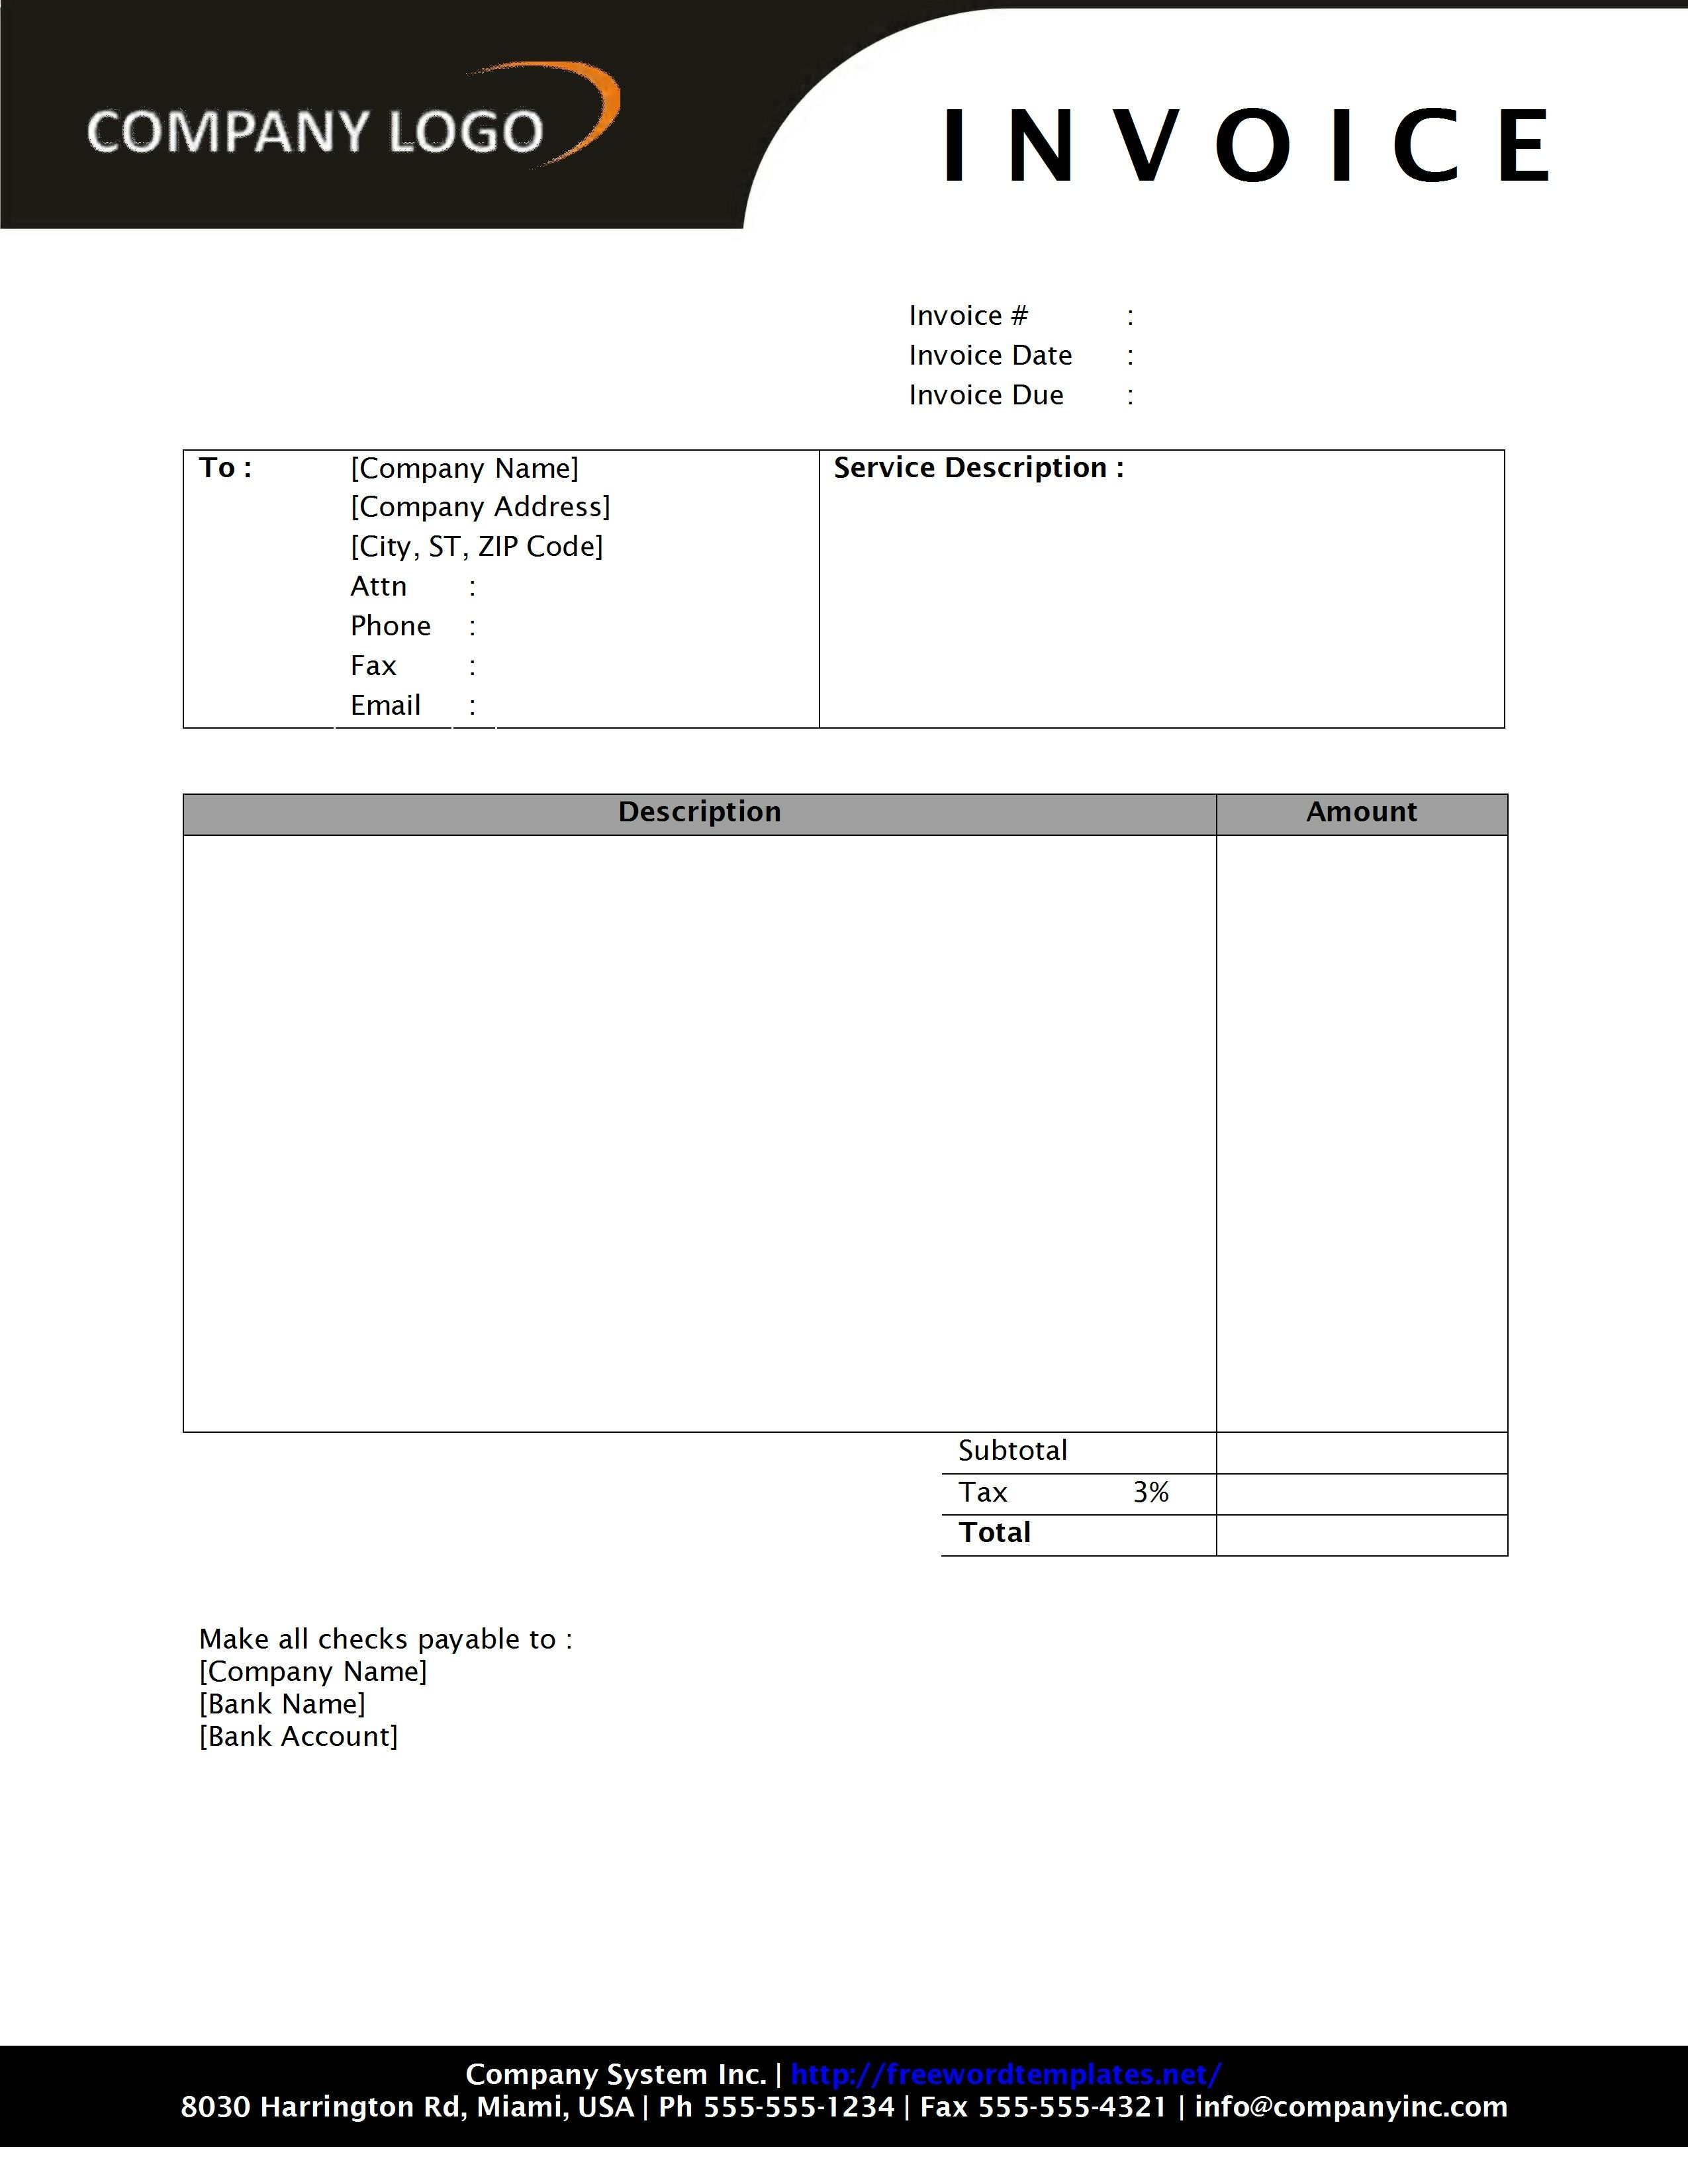 free printable invoice template microsoft word 10 best images of printable invoice template word free word 2550 X 3300